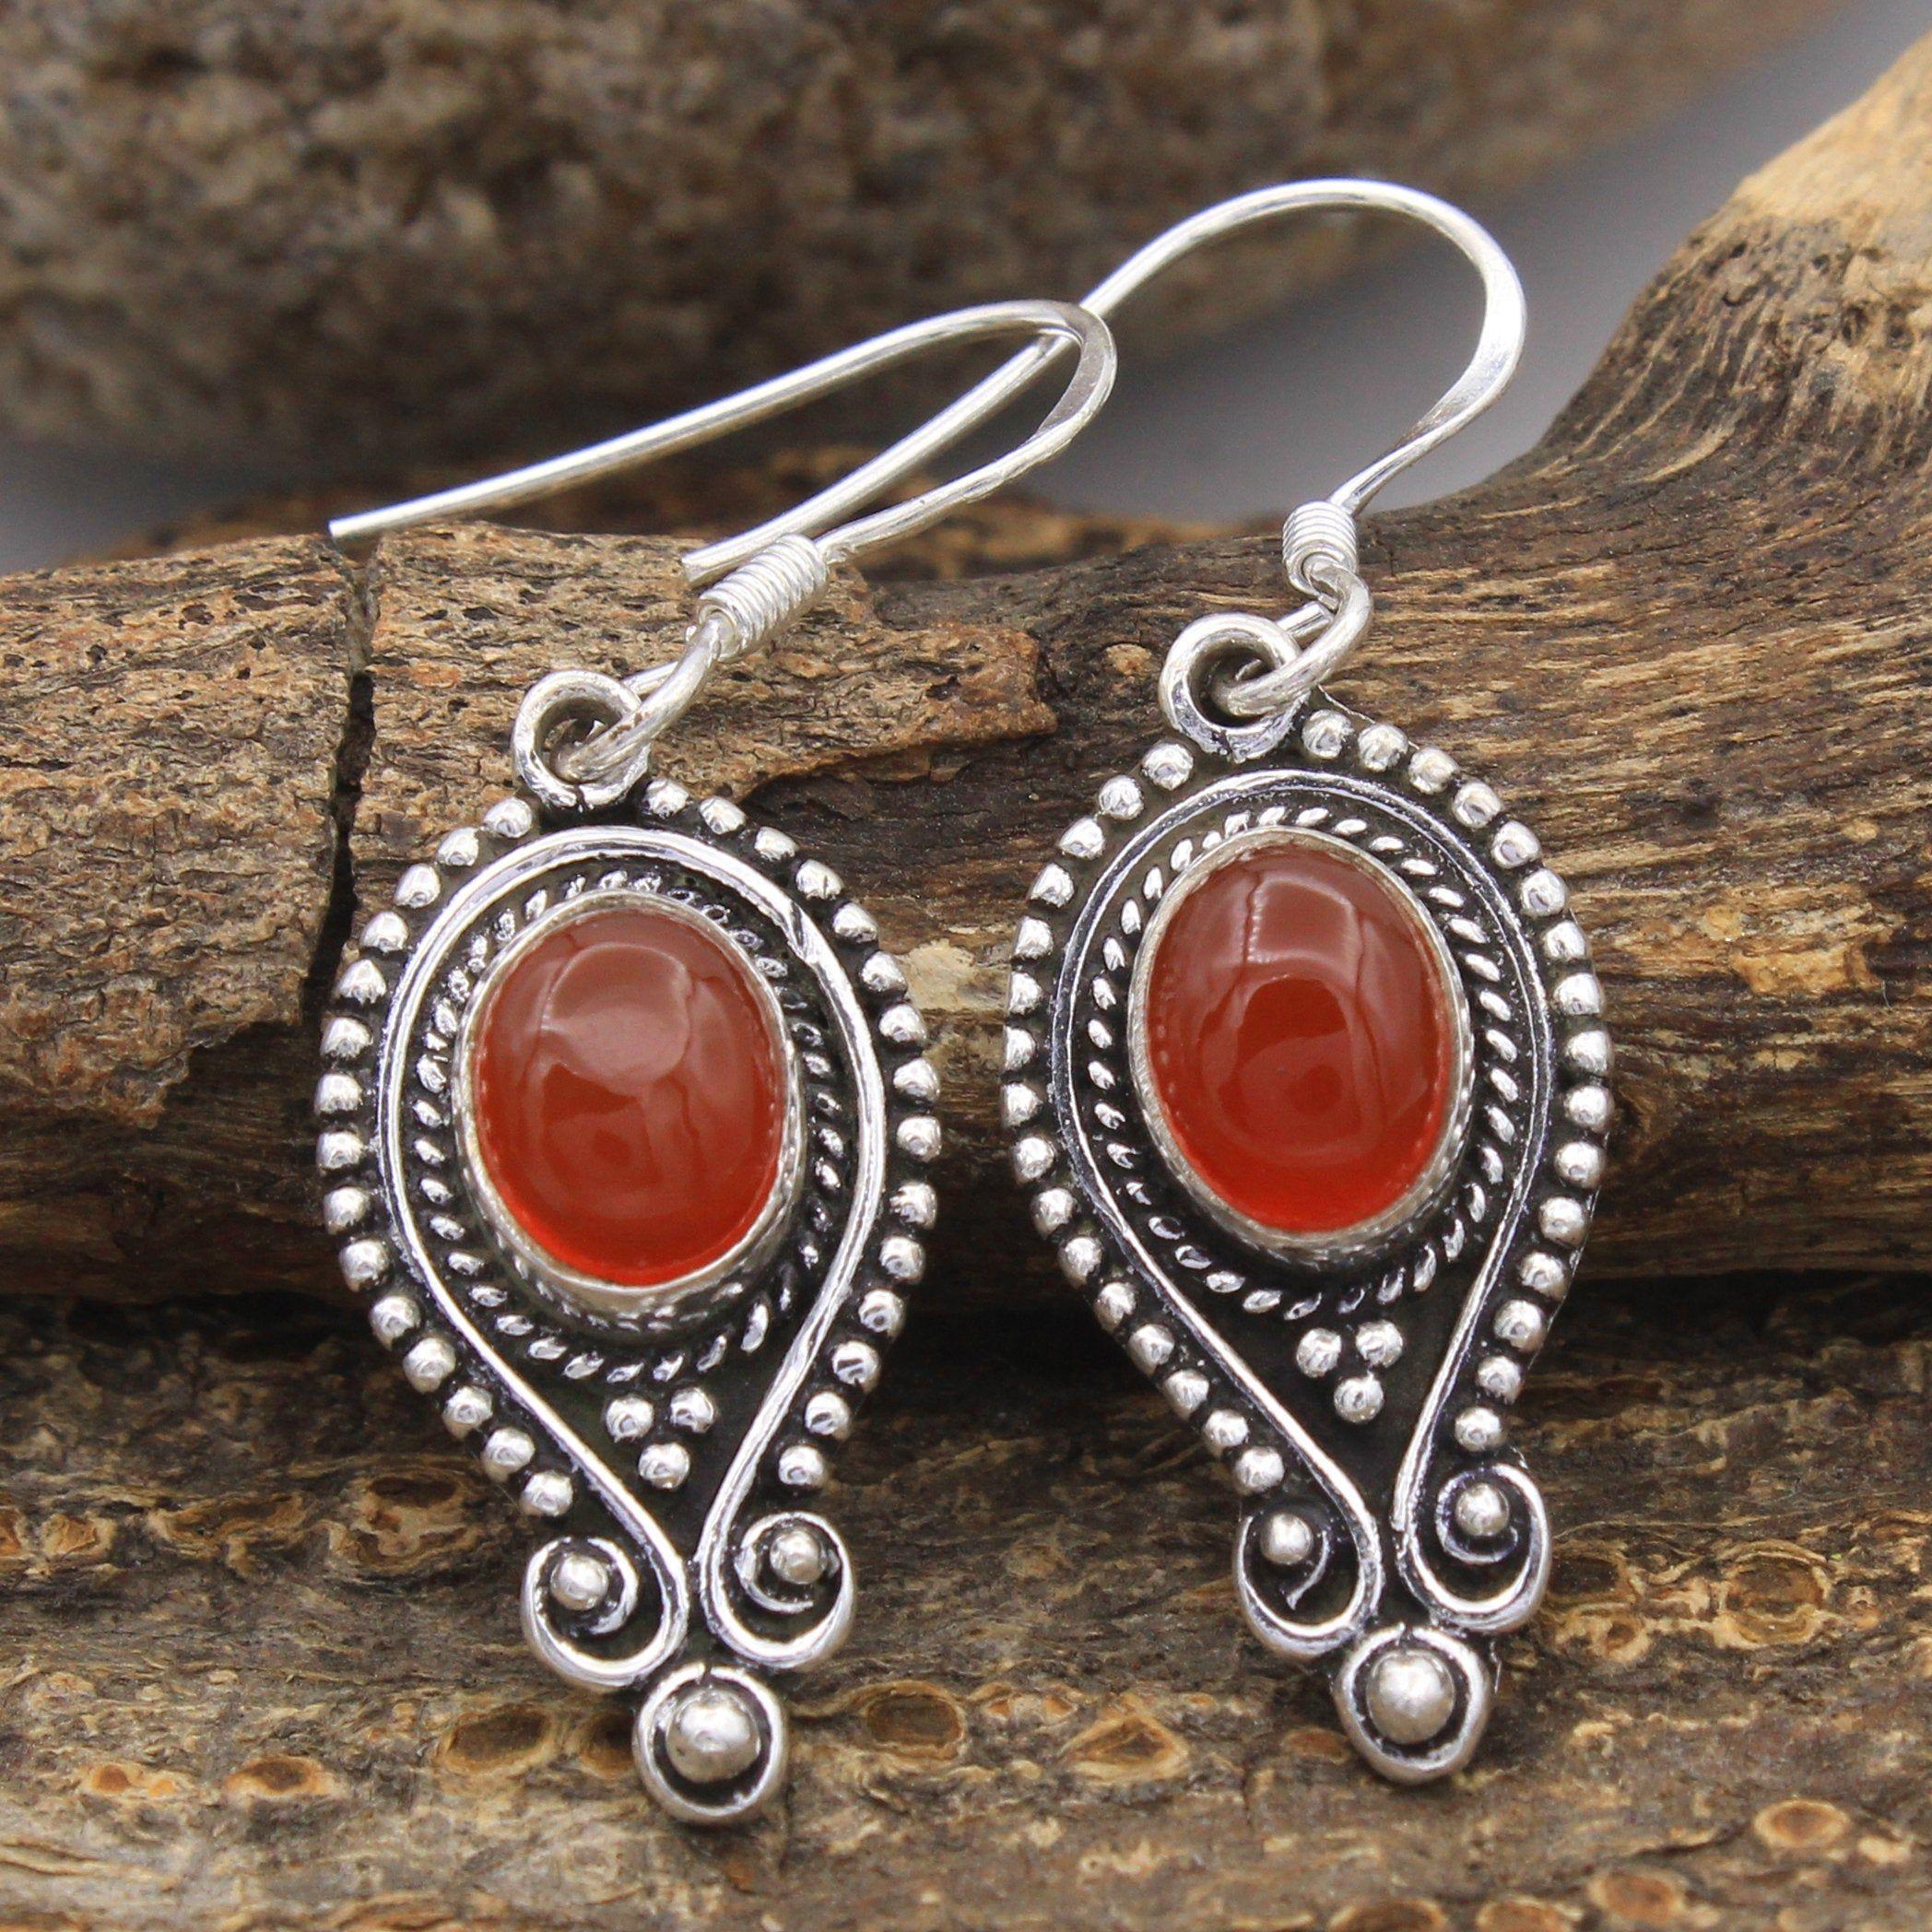 Handmade long drop earrings,Dangle earrings,Oval shaped earrings,Gift for her,Long beaded earrings,Agate beads,Modern earrings,